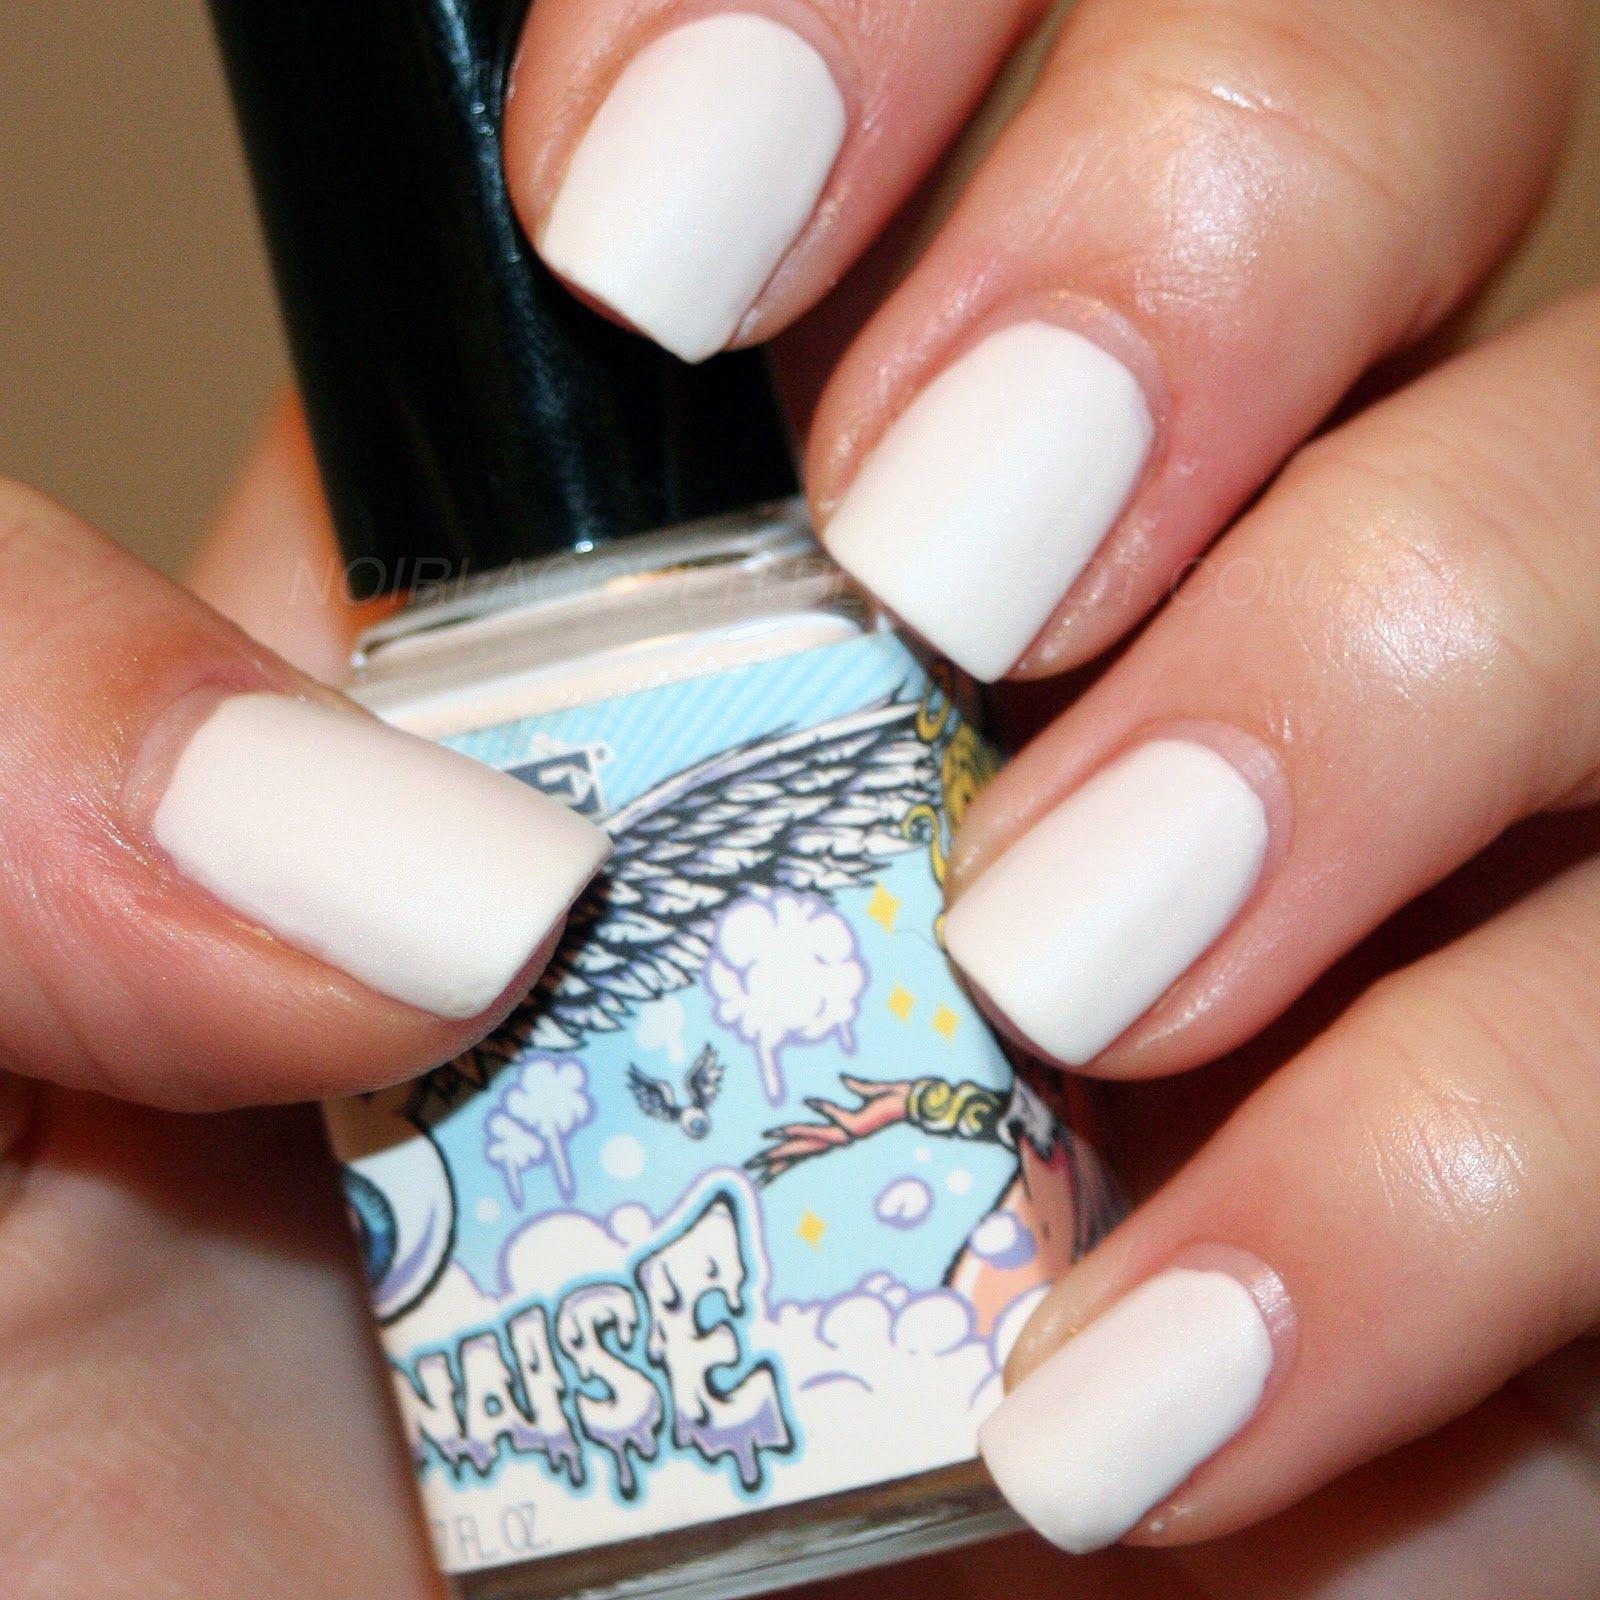 Manglaze Mayonnaise - Love it, have it! | Nail Polish Owned ...